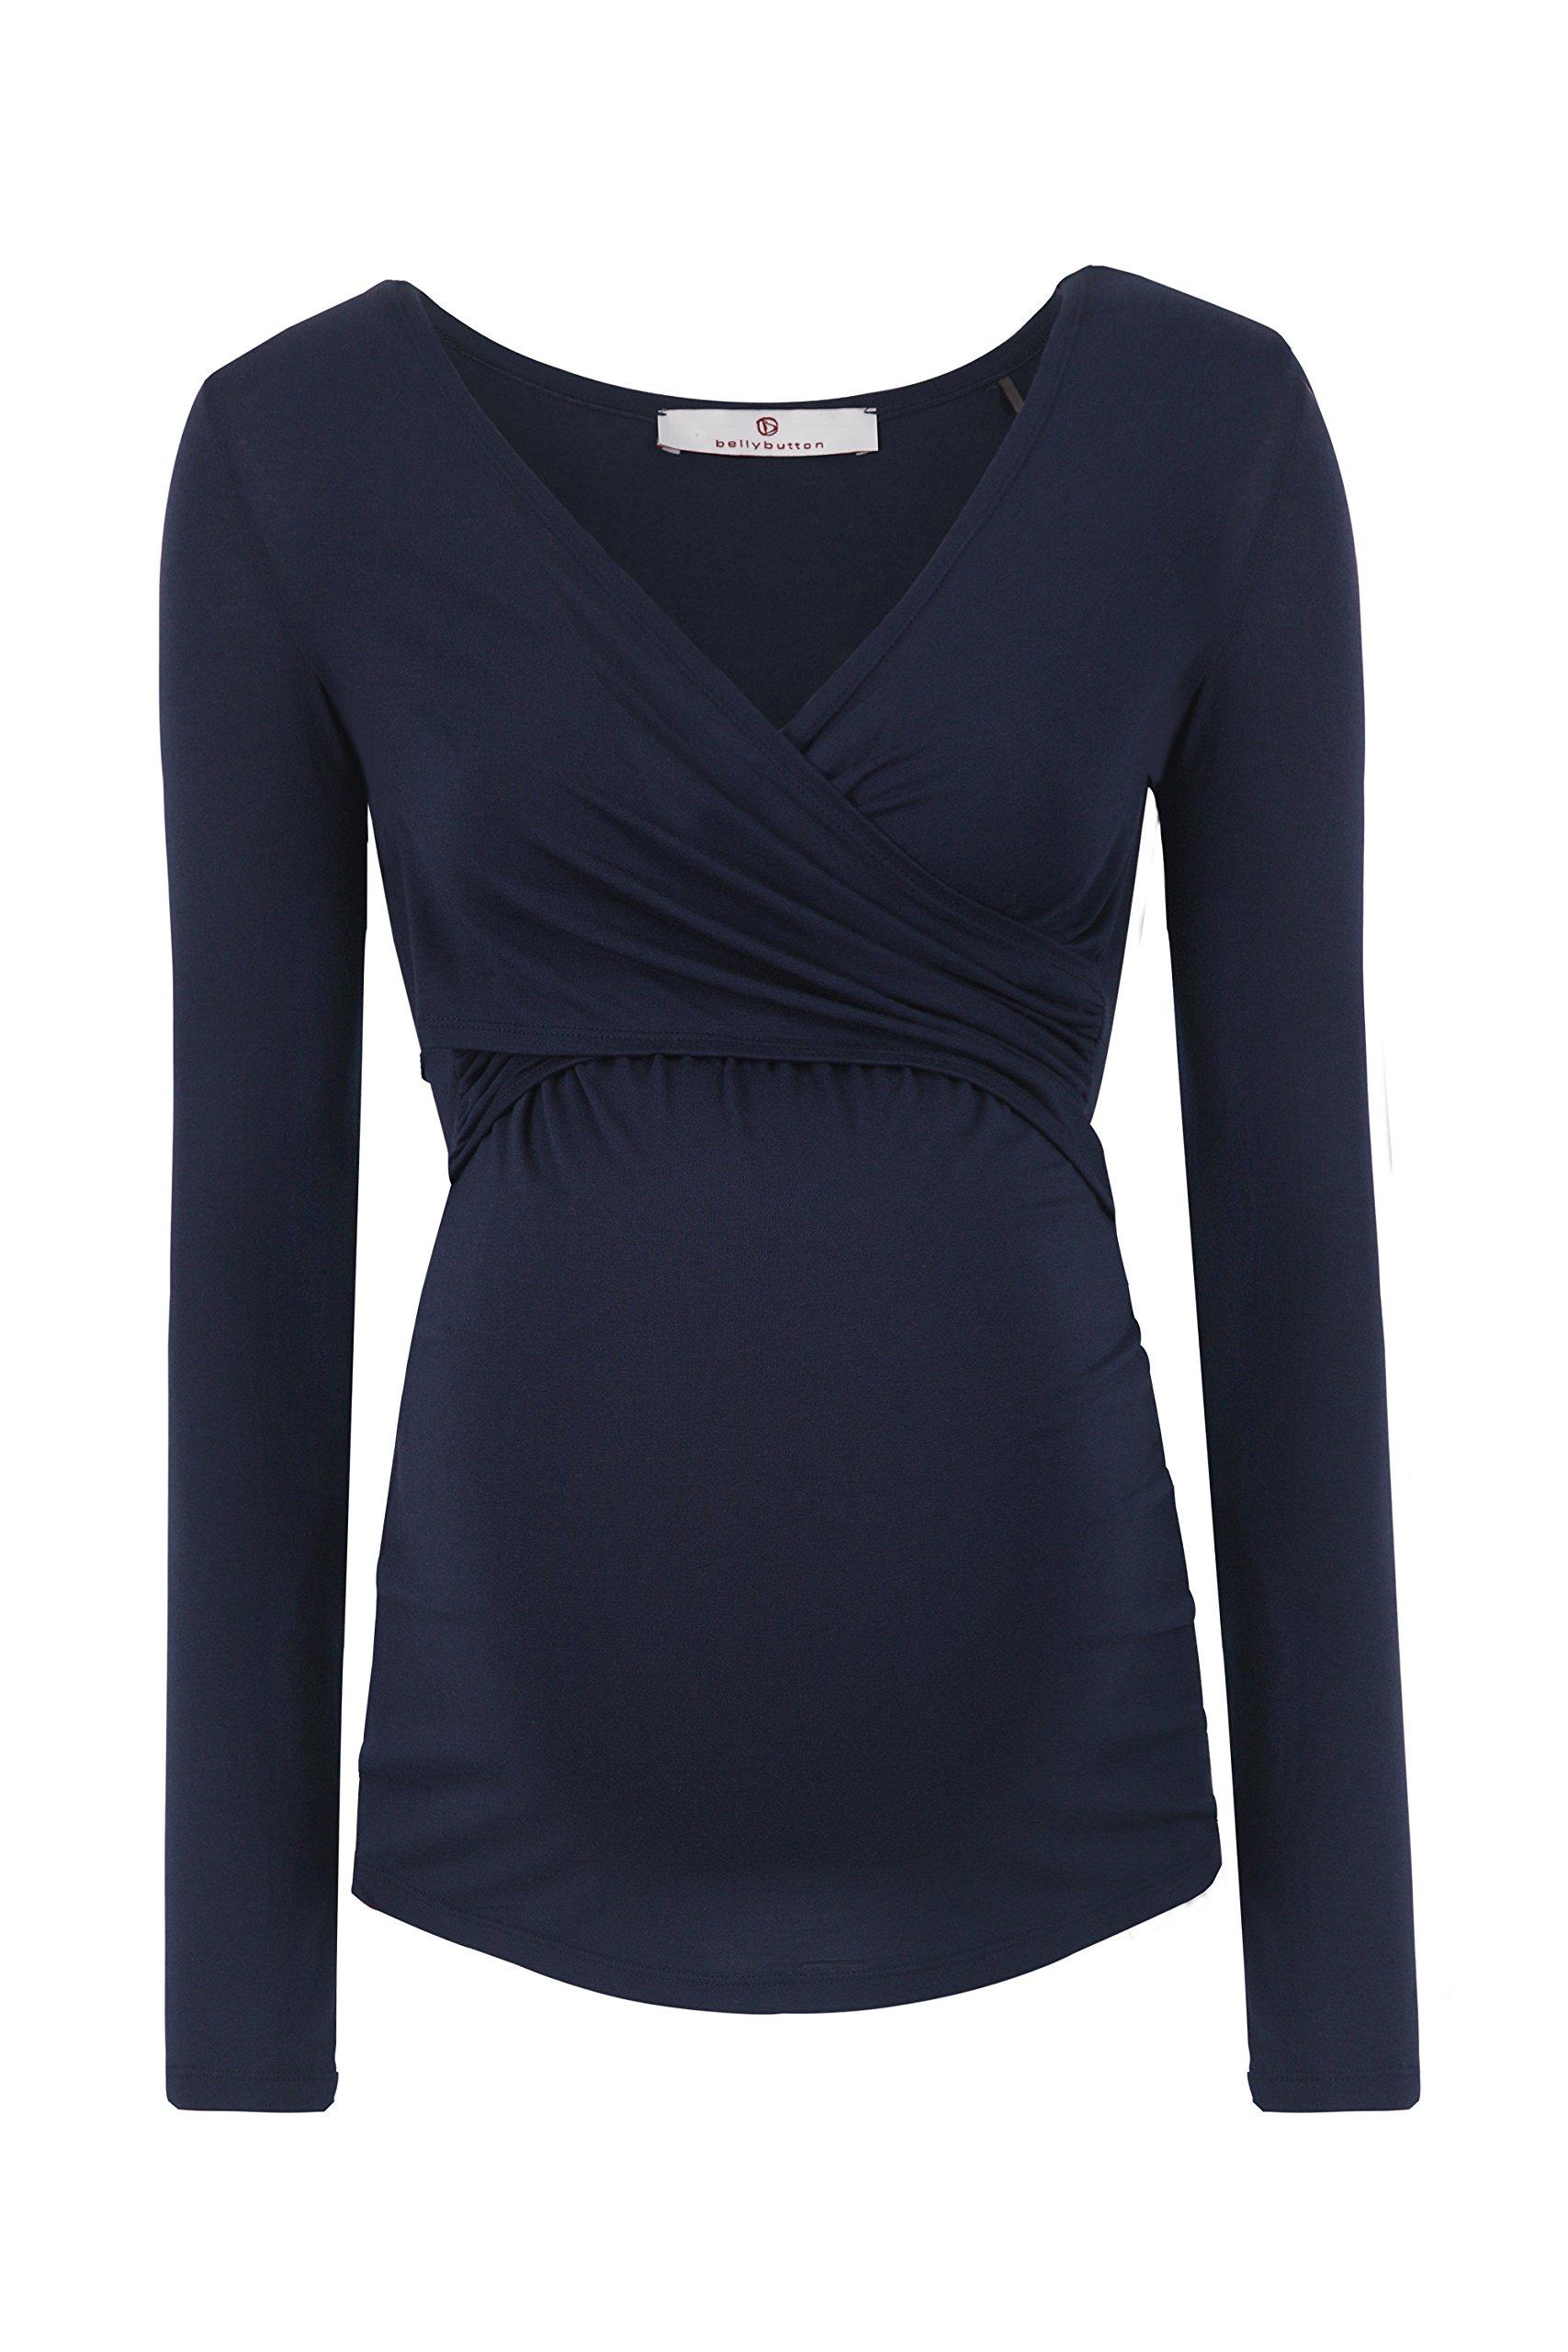 bellybutton Laila-Stillshirt 1/1 Arm, Maglie a Maniche Lunghe Premaman Donna, Blau (Istanbul 3404),